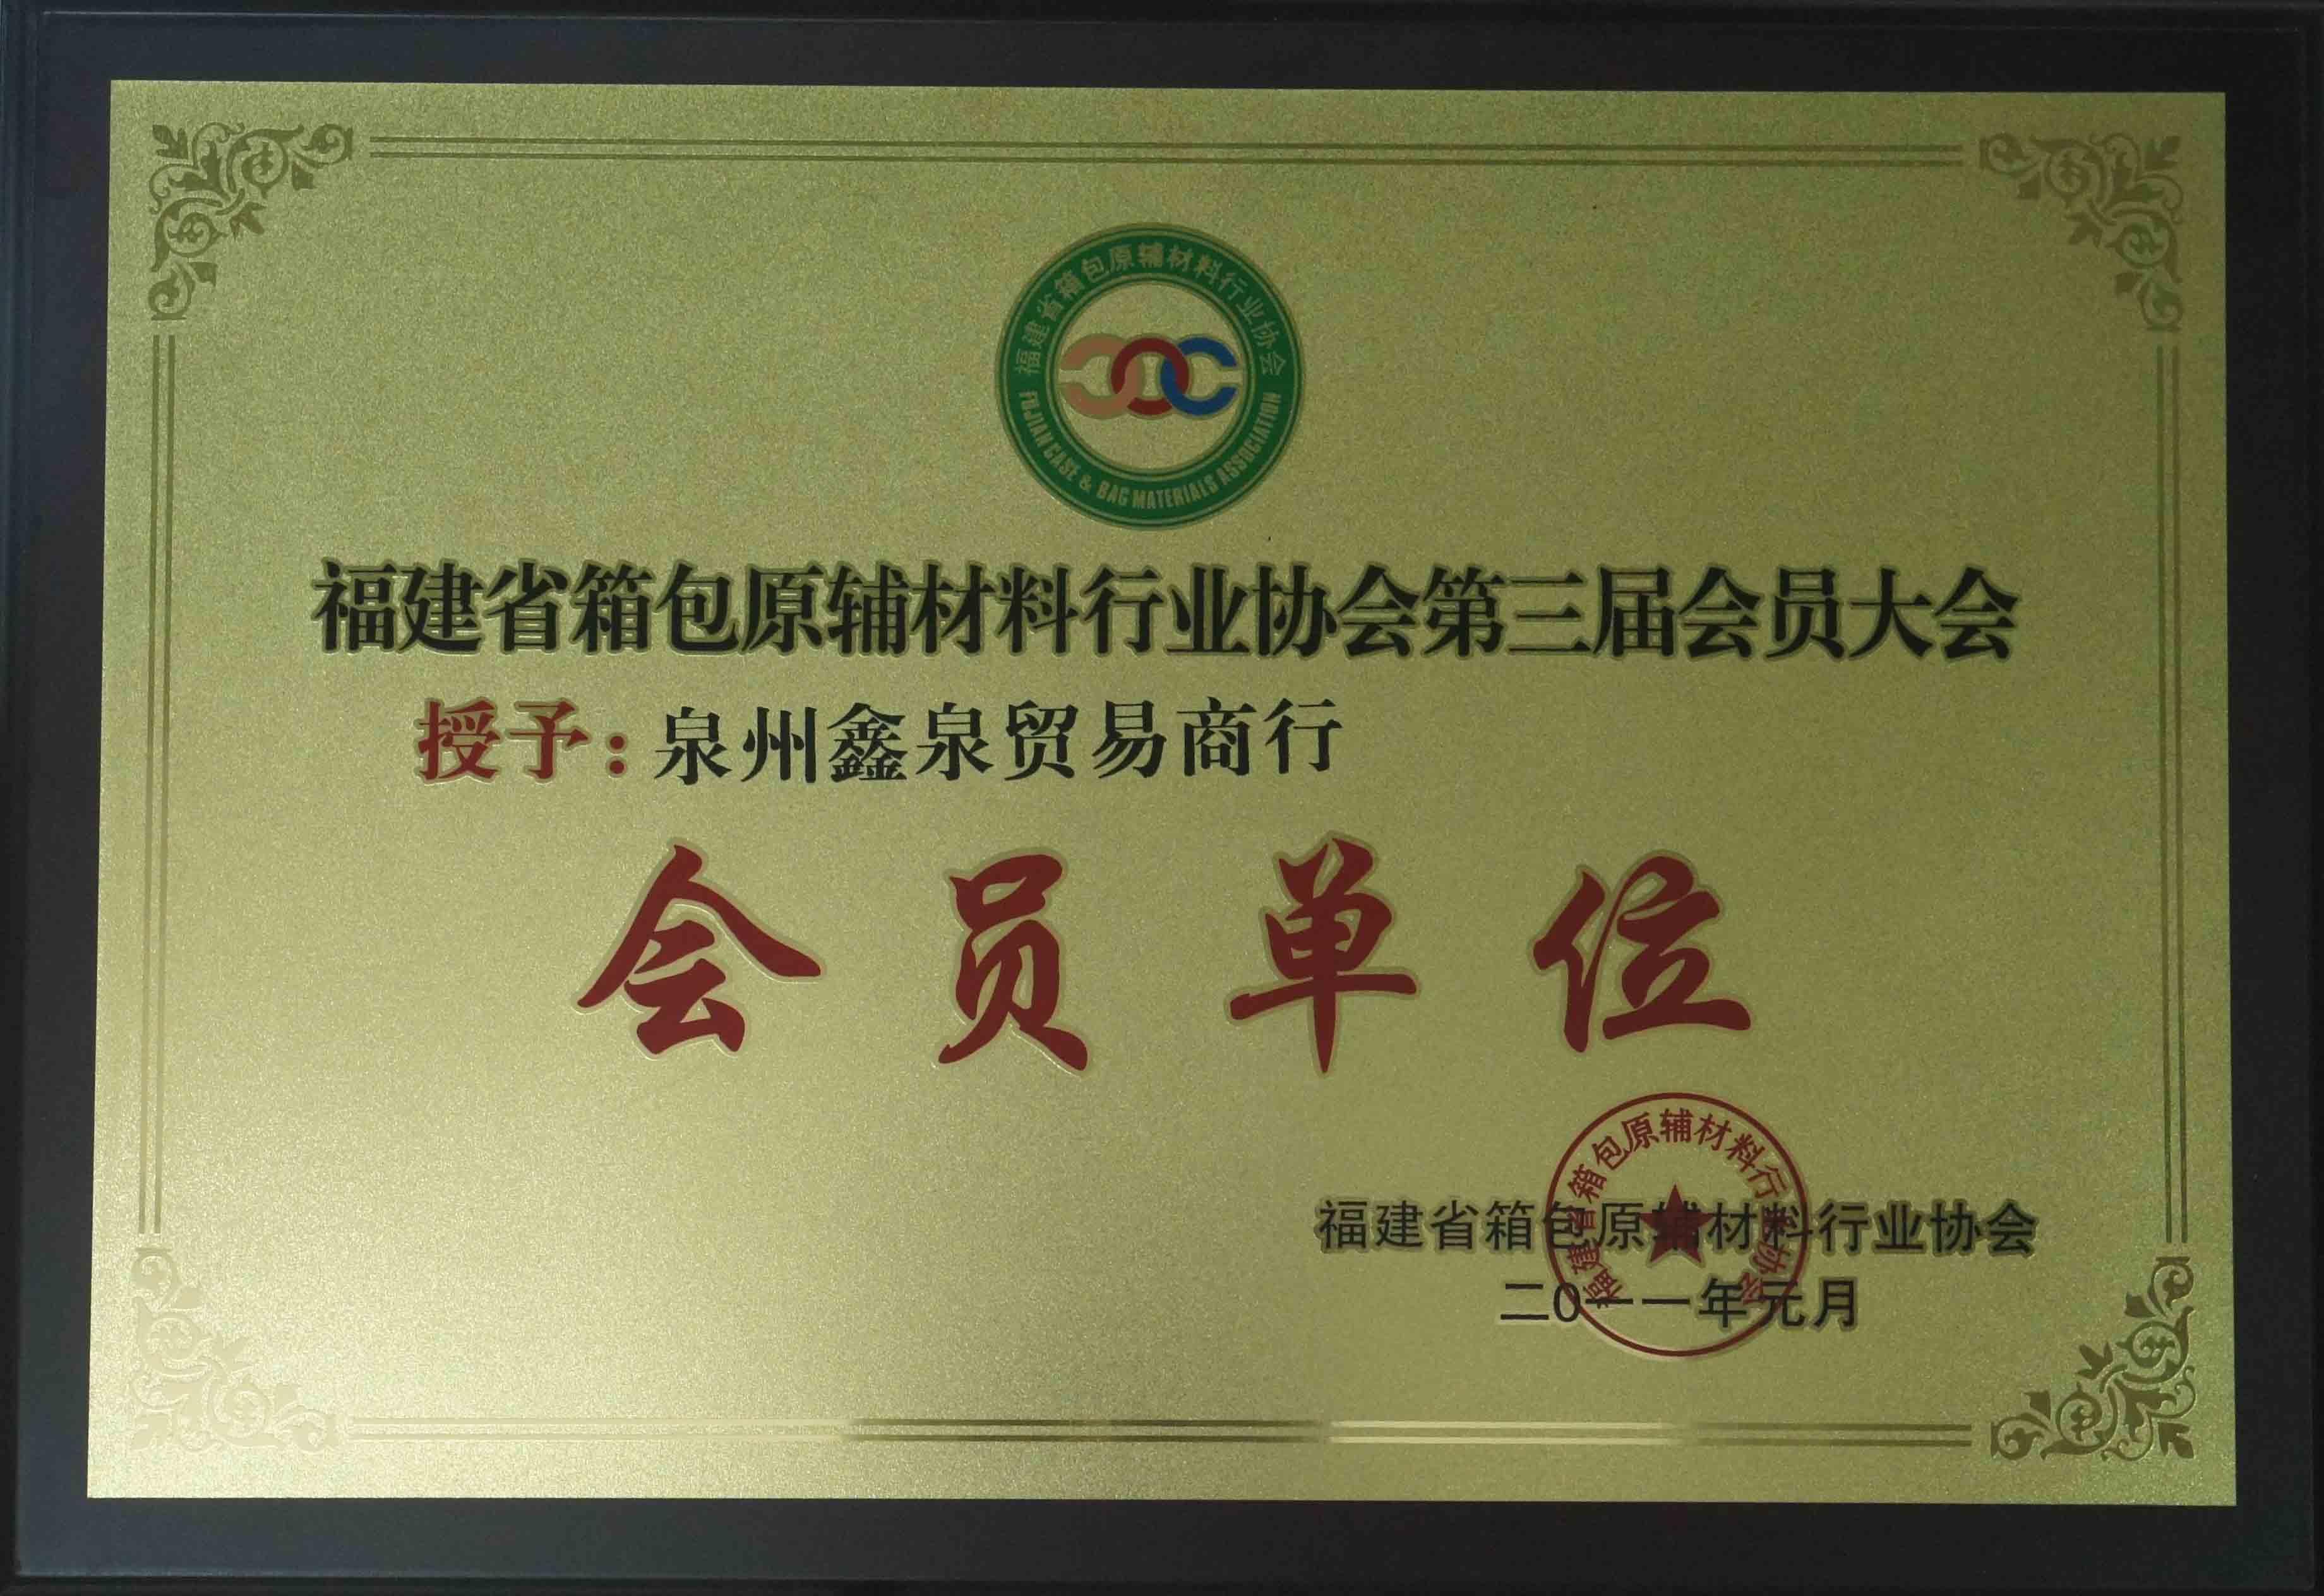 Member of Fujian Case & Bag Materials Association